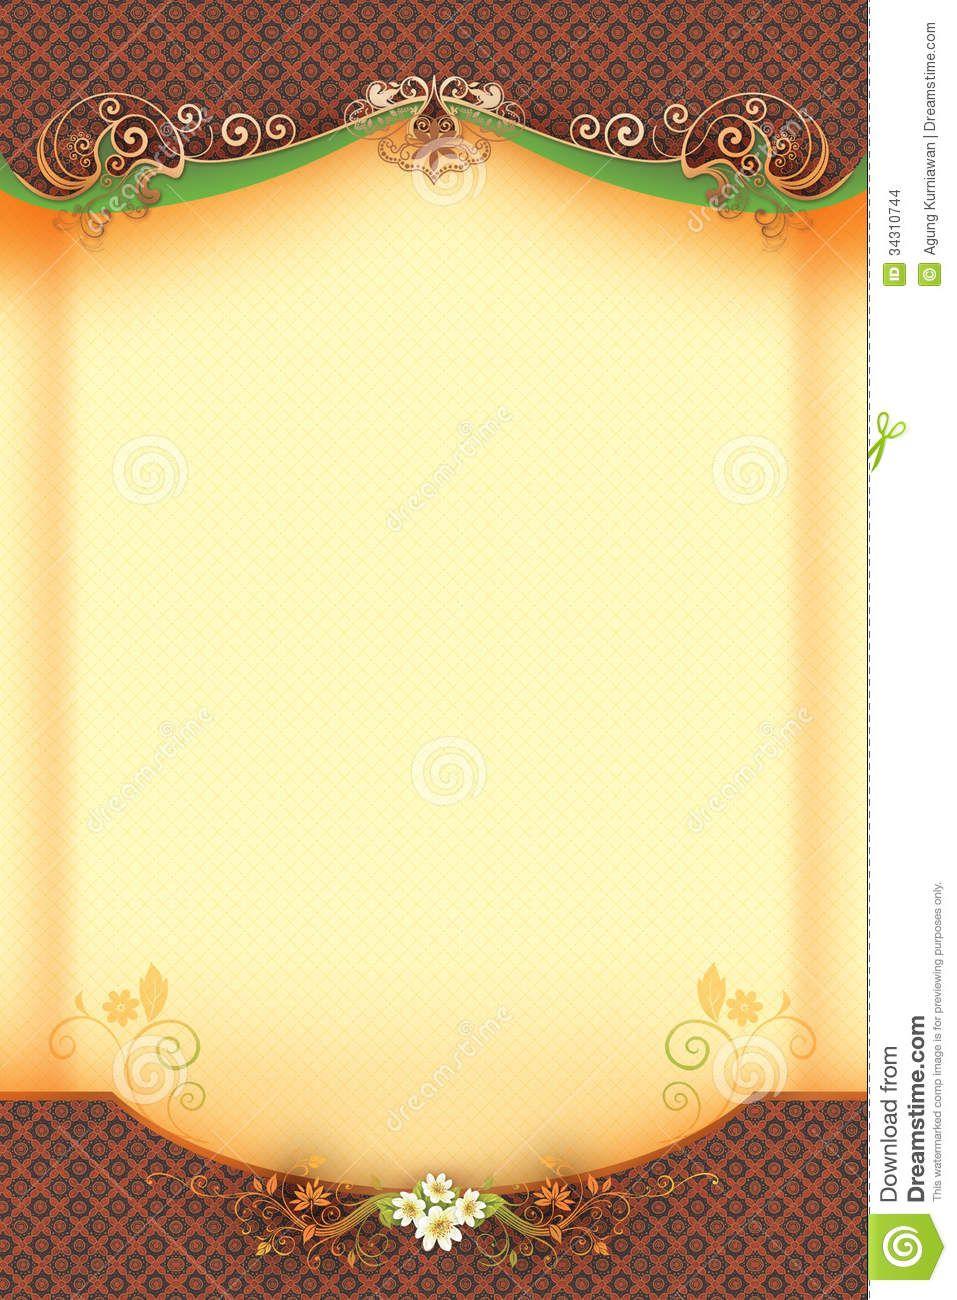 20 Unique Background Of Invitation Card Stock Em 2020